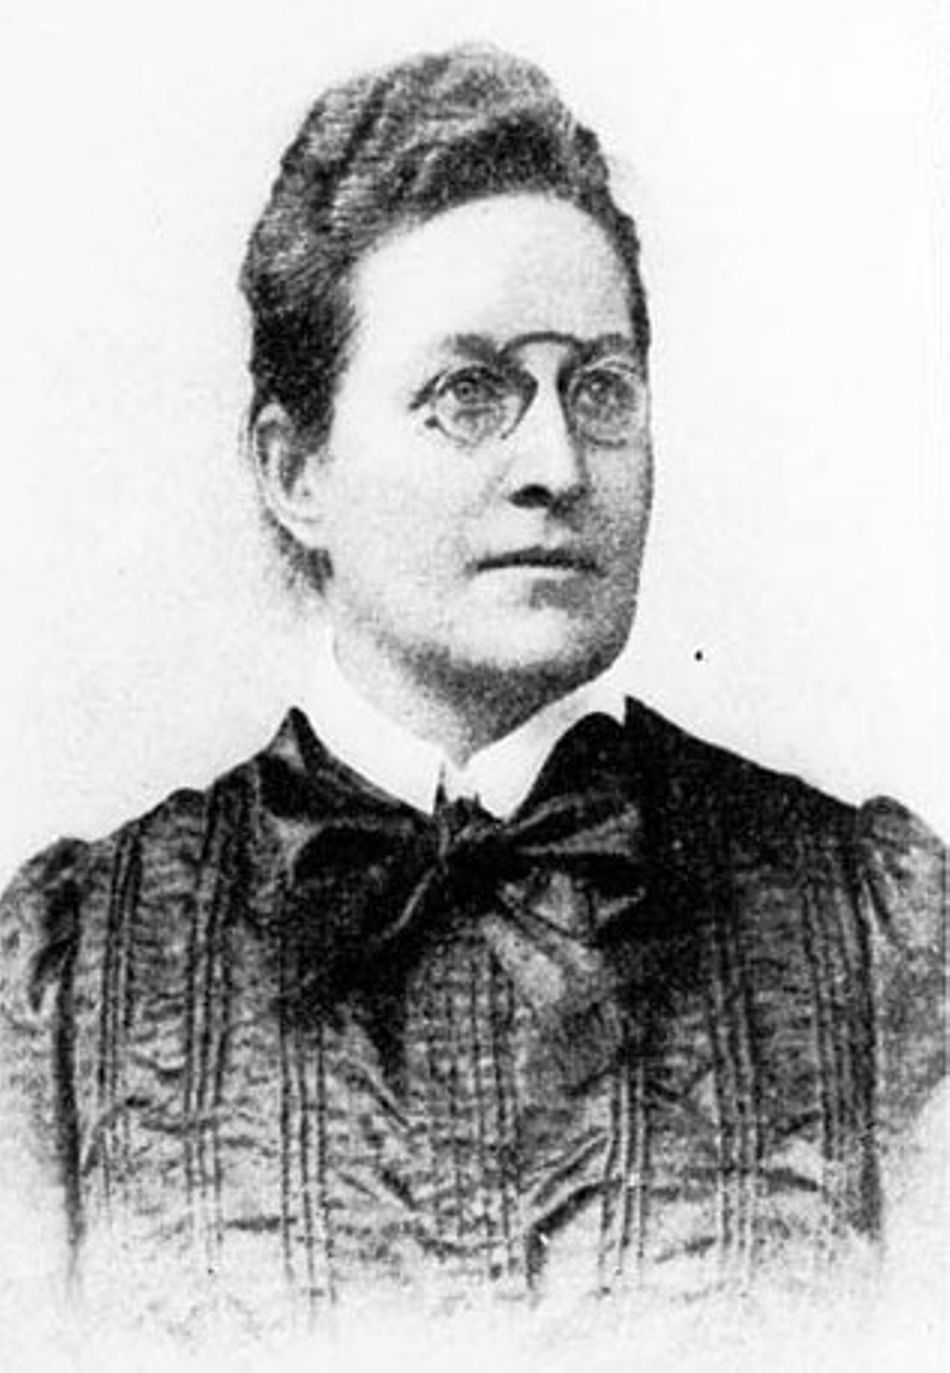 Anna Pappritz